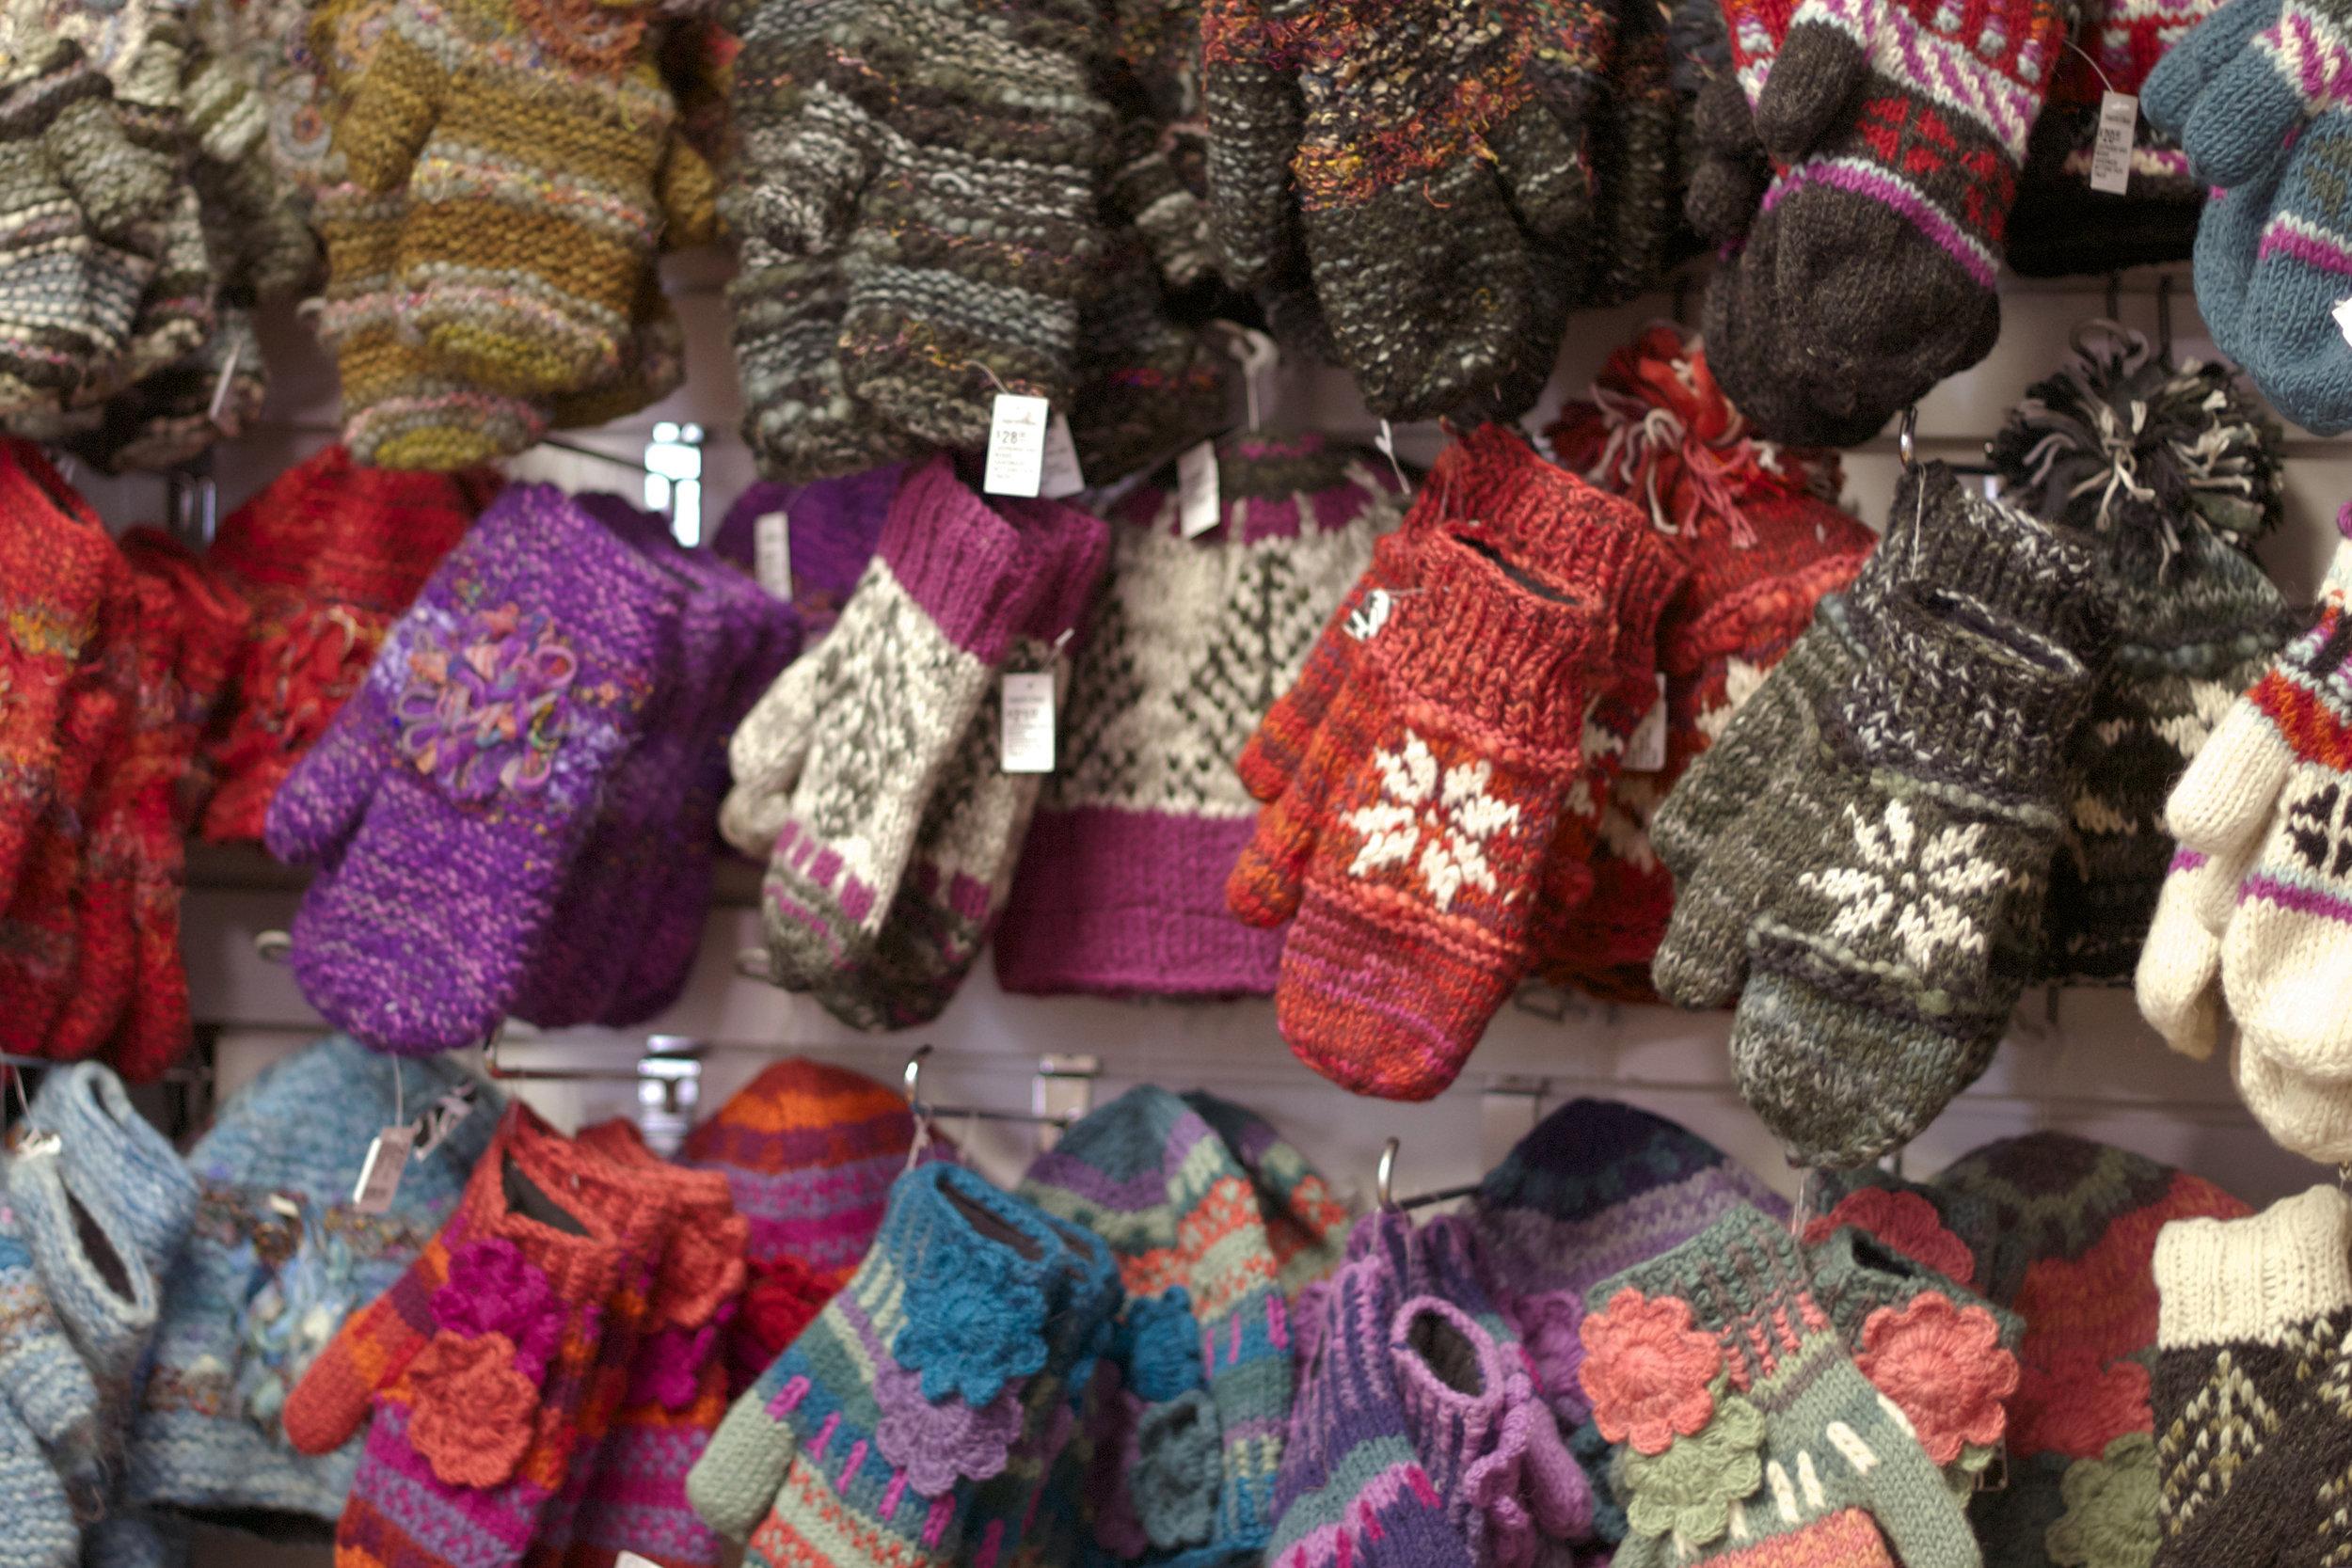 wall-of-mittens.jpg